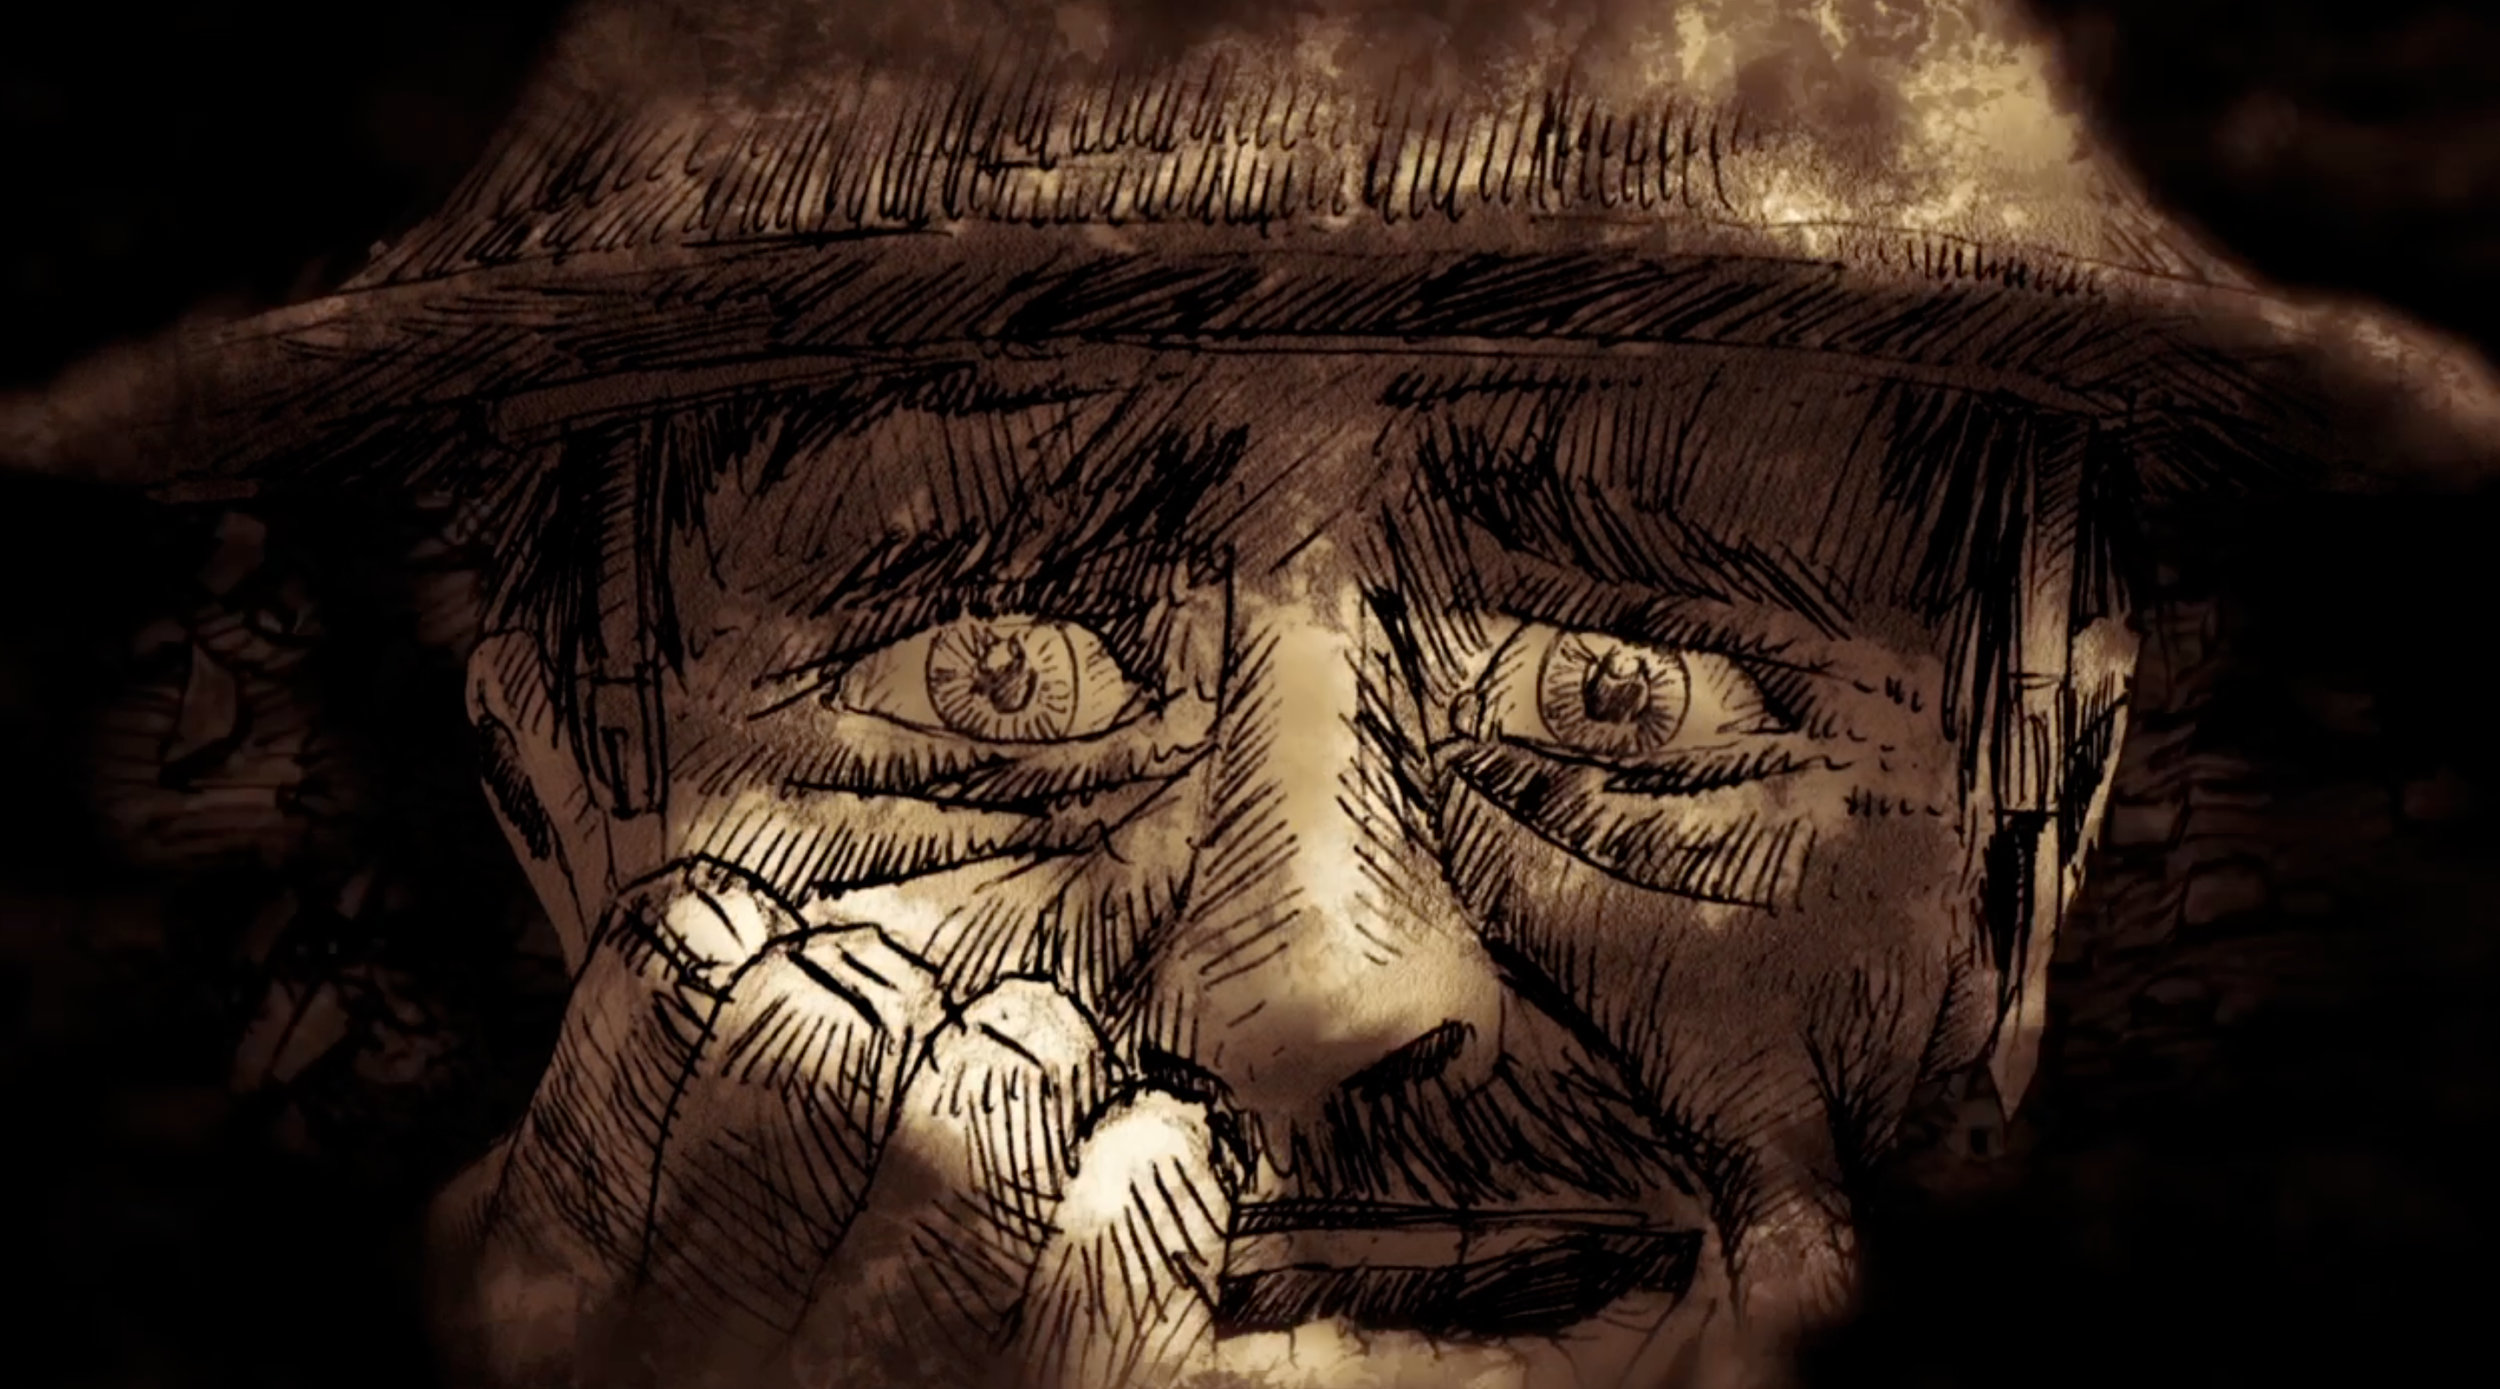 (Image: filmincork.com)